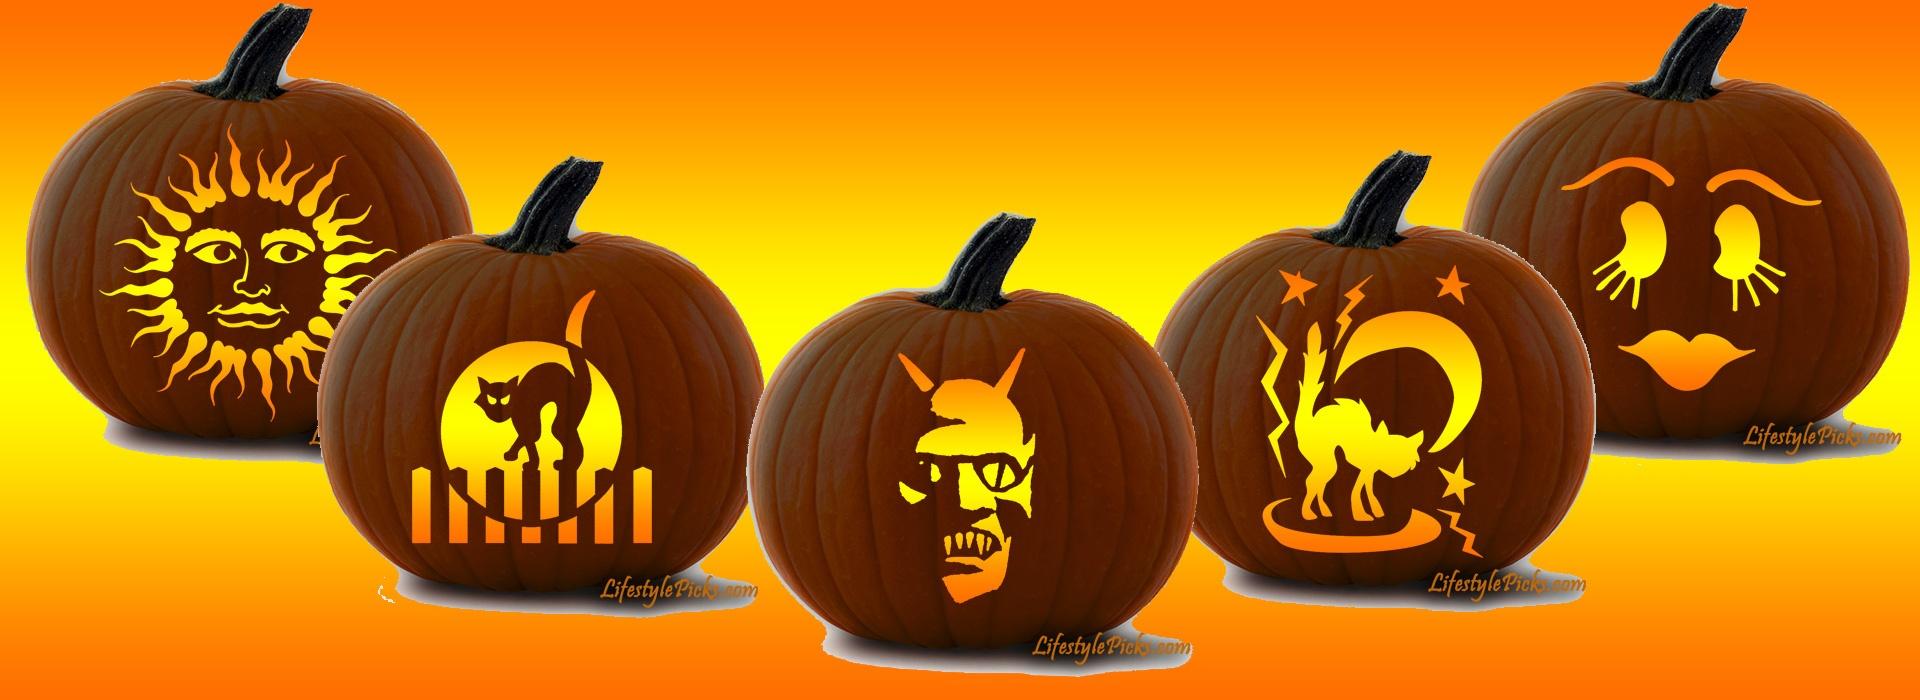 Free Pumpkin Carving Stencils - Pirate, Cat, Aztec Sun, Michael - Halloween Pumpkin Carving Stencils Free Printable